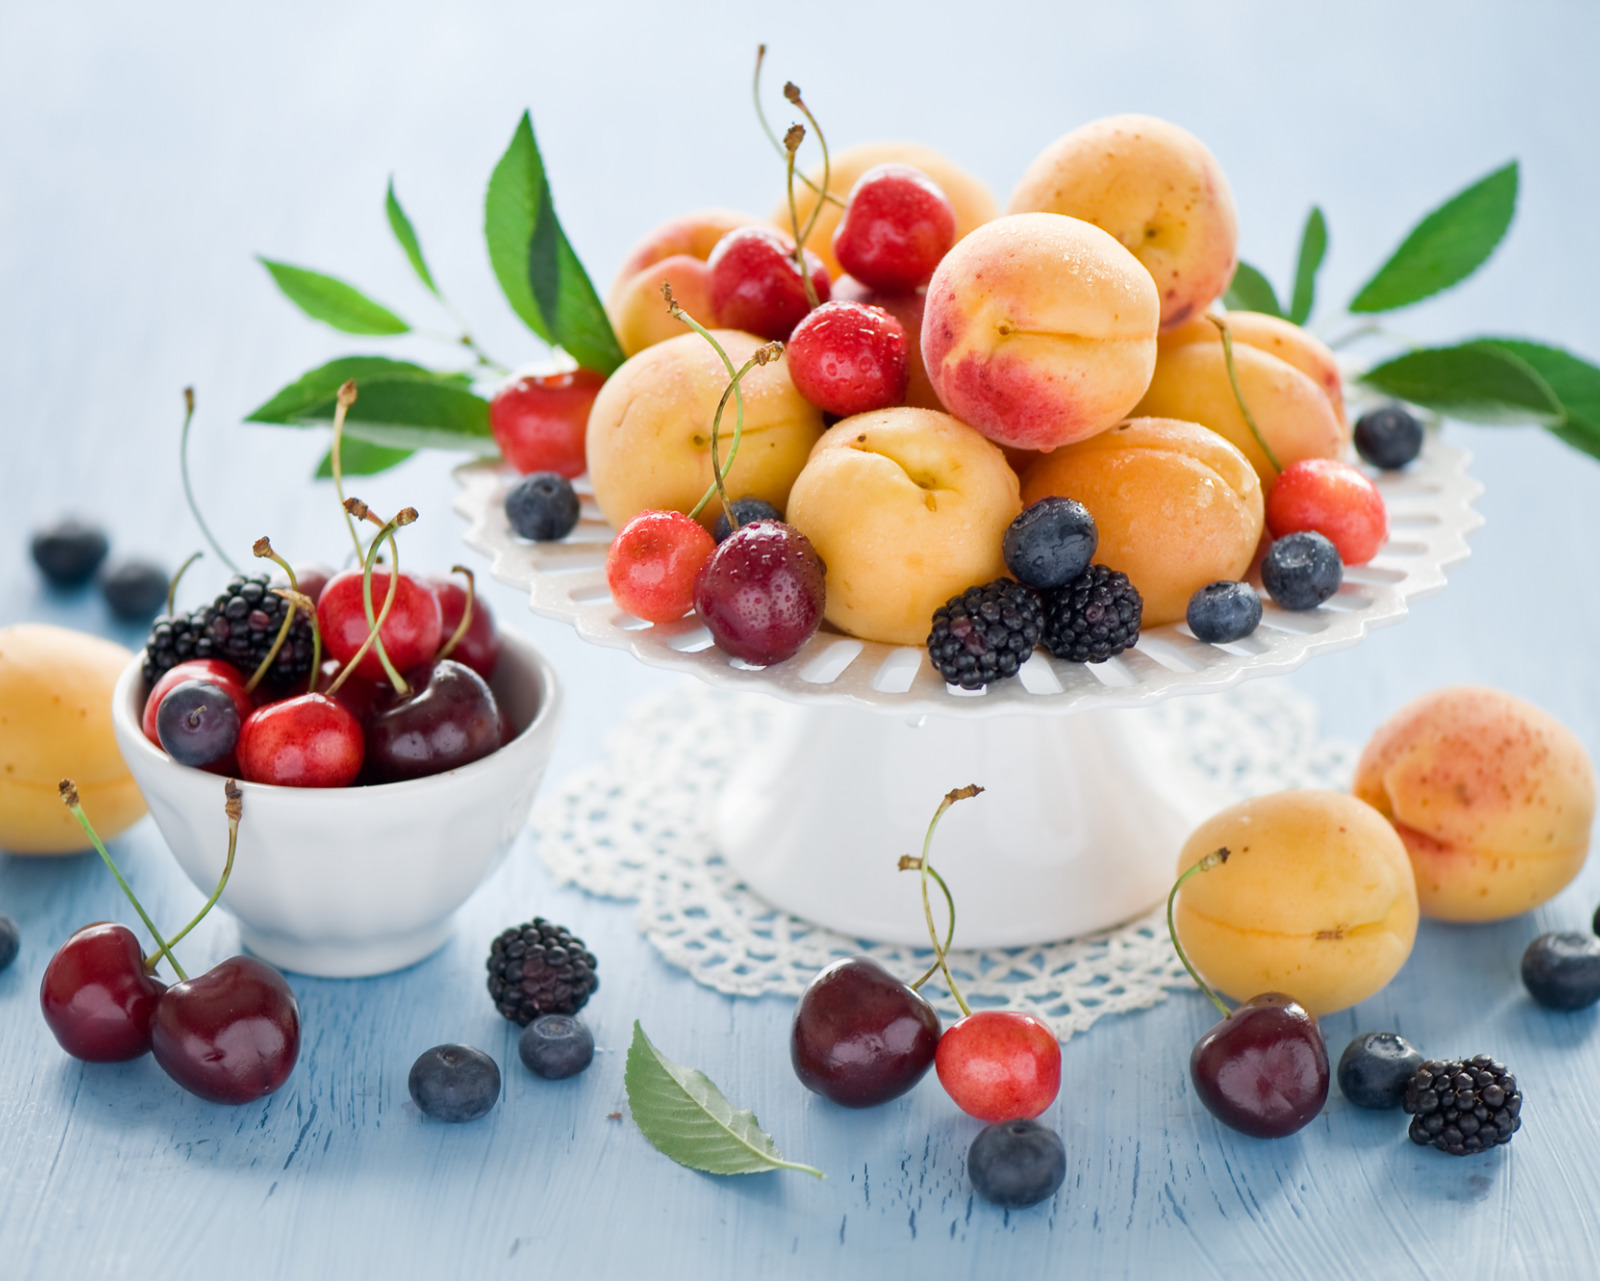 wallpaper fresh fruits berries - photo #2